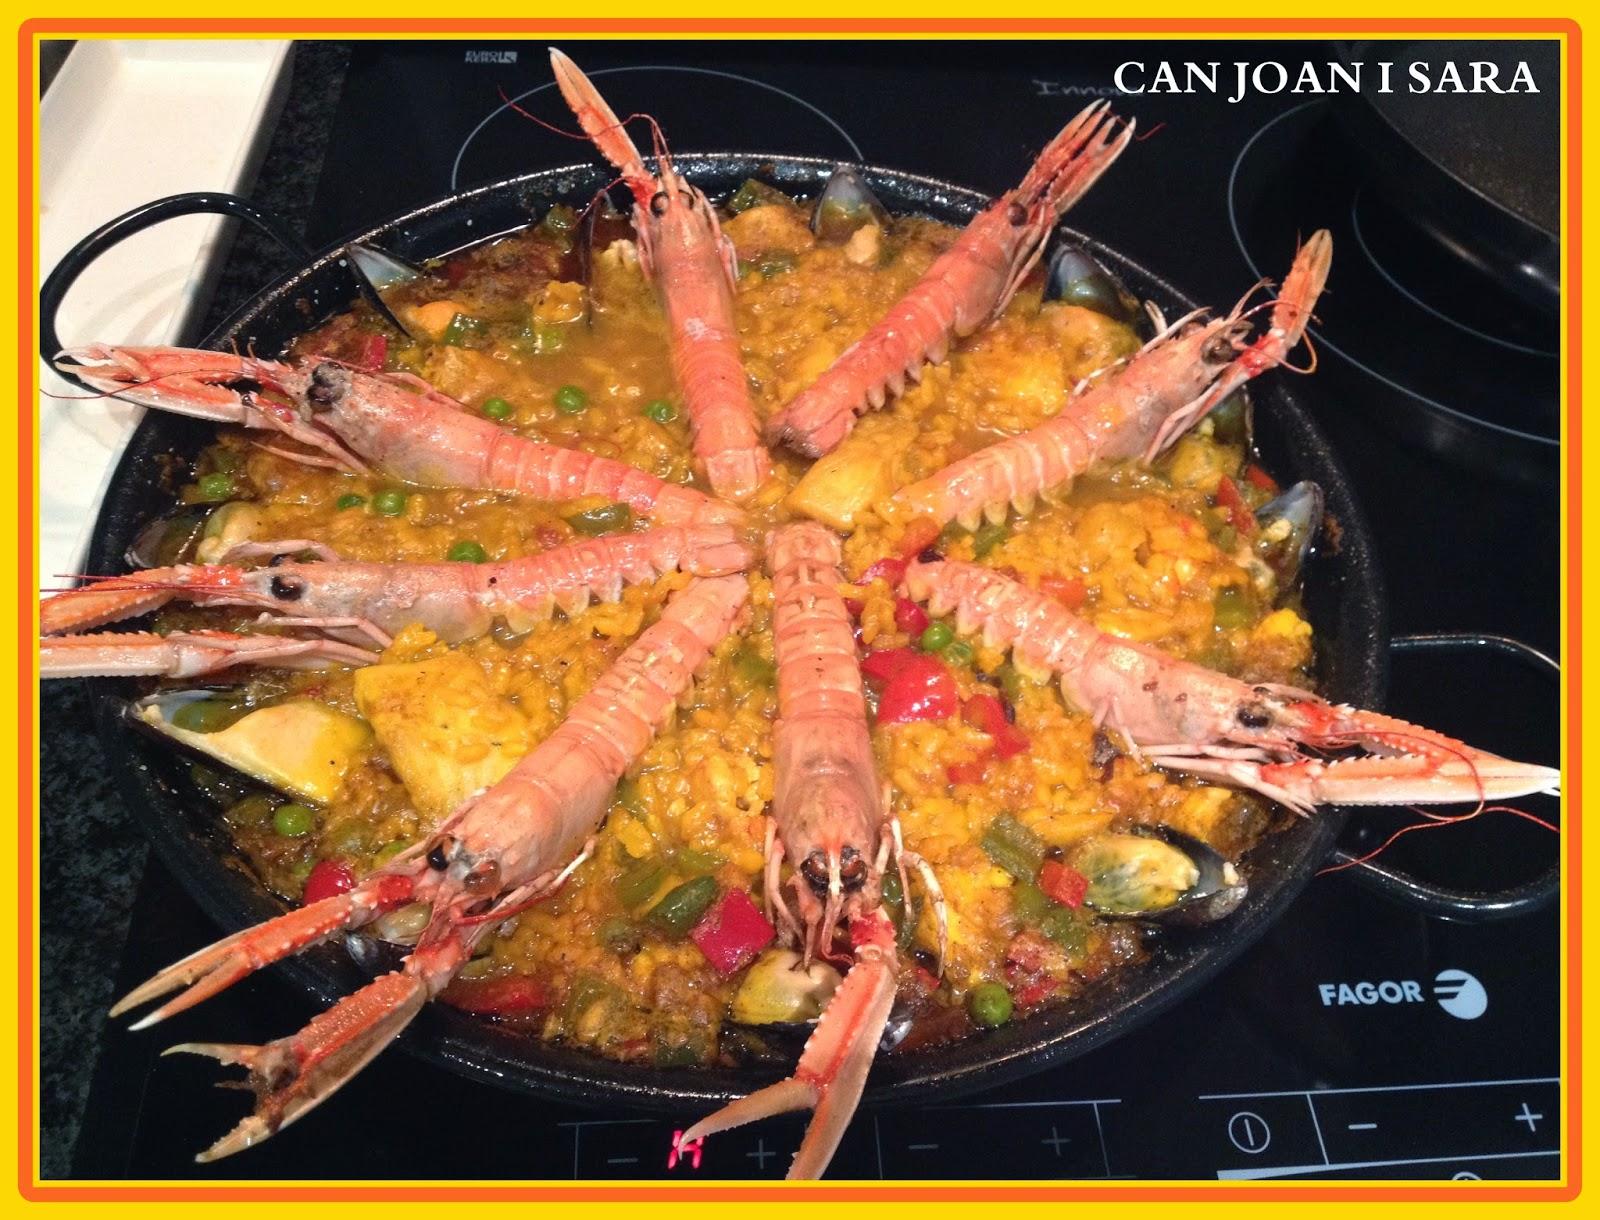 Paella con merluza y cigalas recetas de cocina - Cocina con sara paella ...